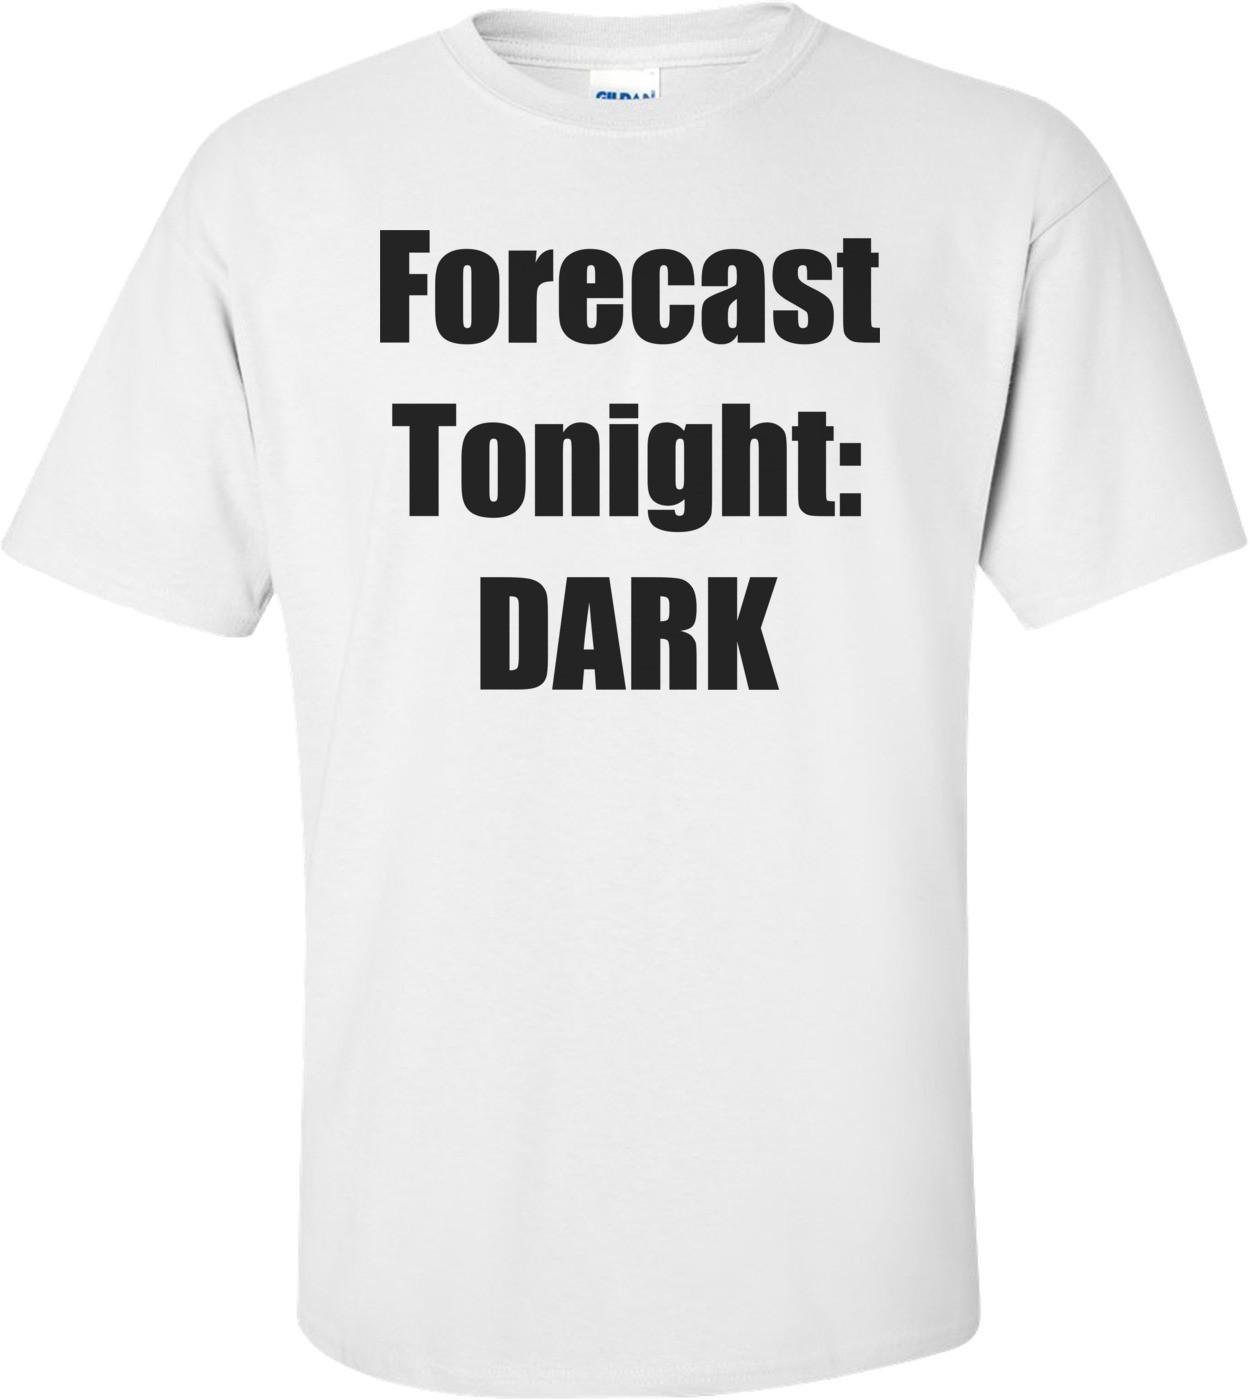 Forecast Tonight: DARK Shirt